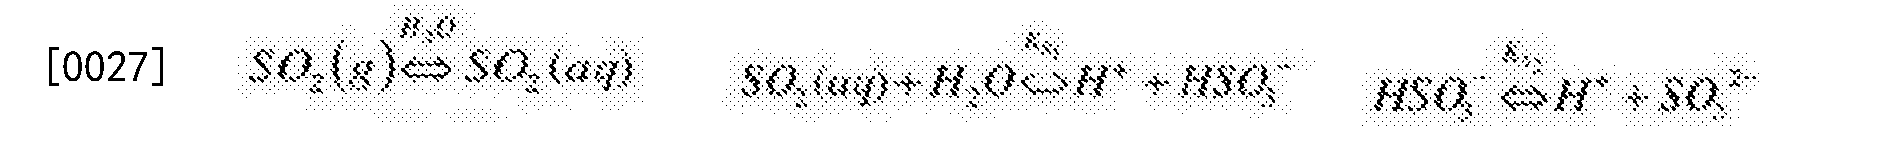 Figure CN107321149AD00052